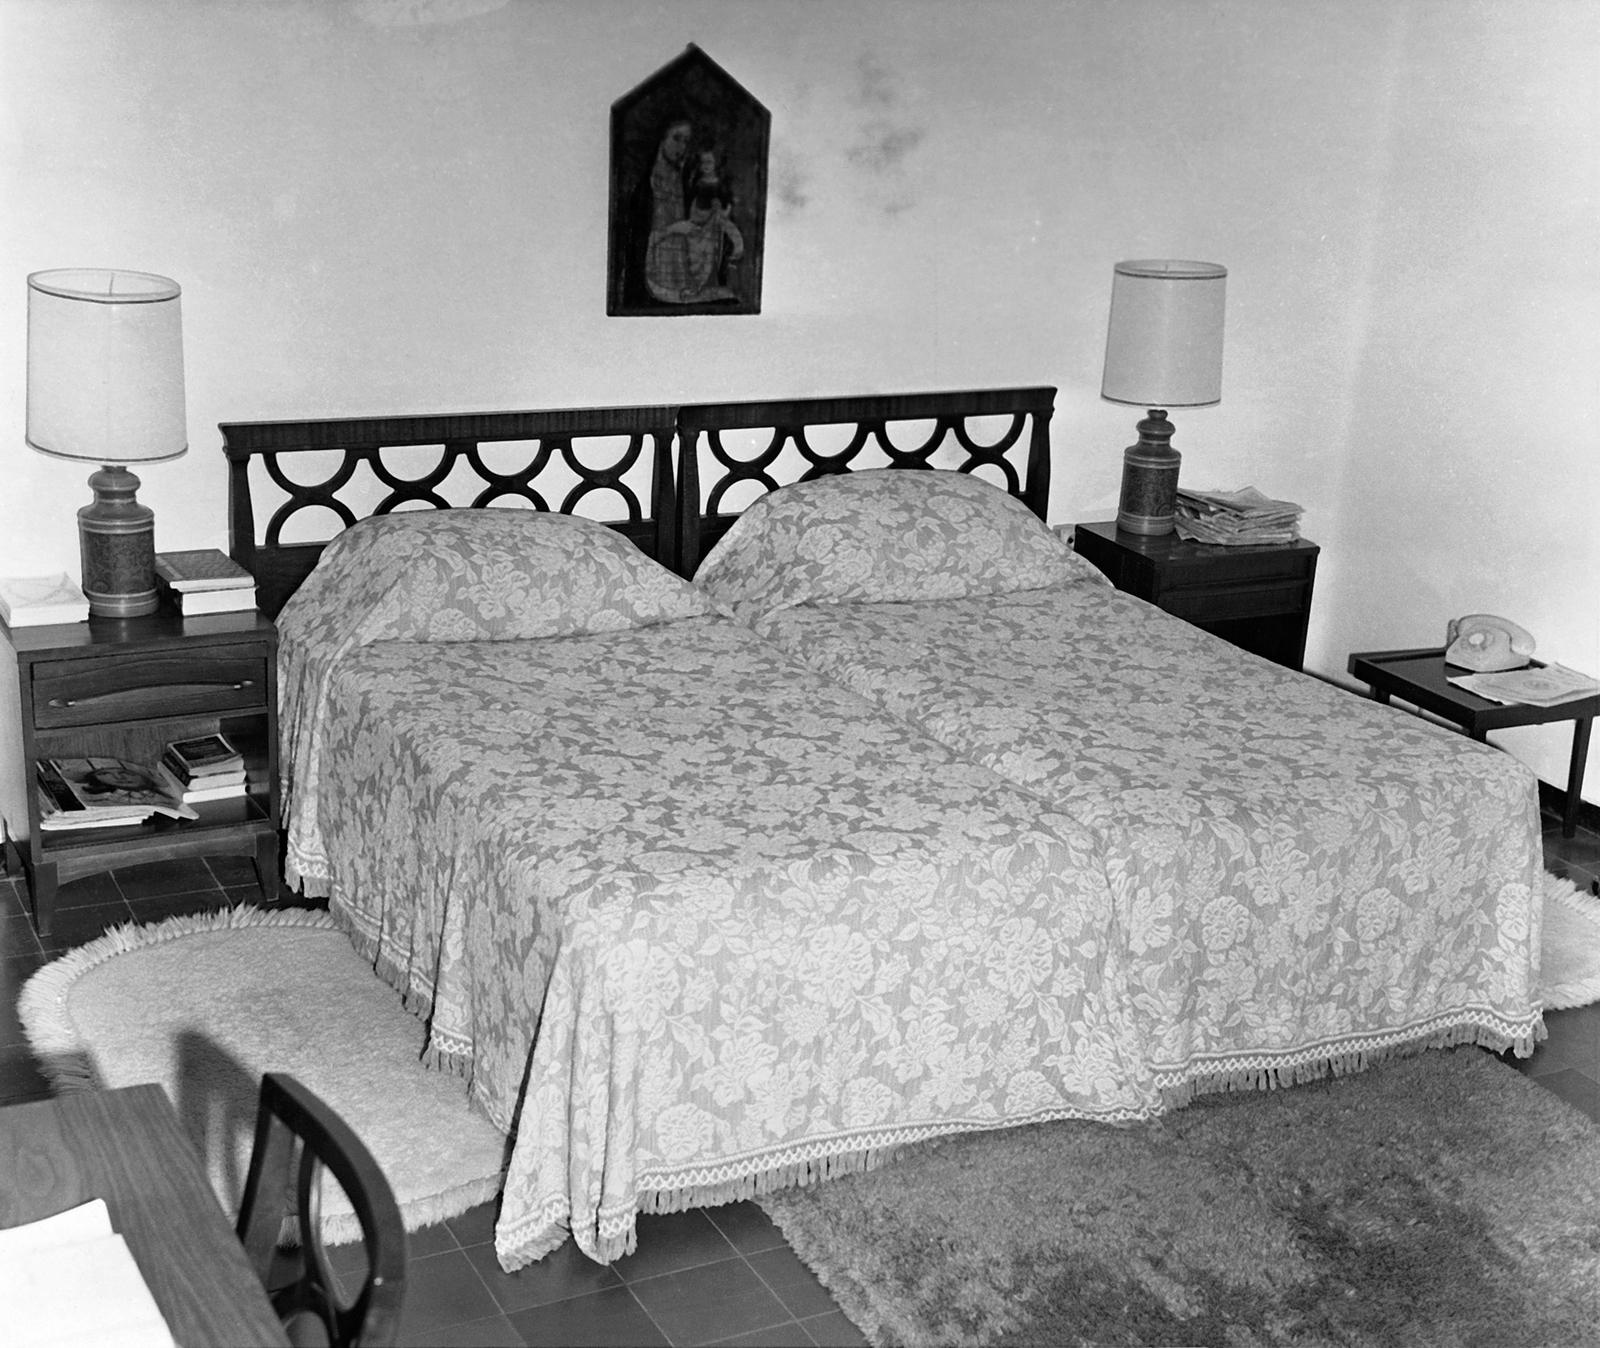 Kinshasa - Mid-Level Position Residence - 1972